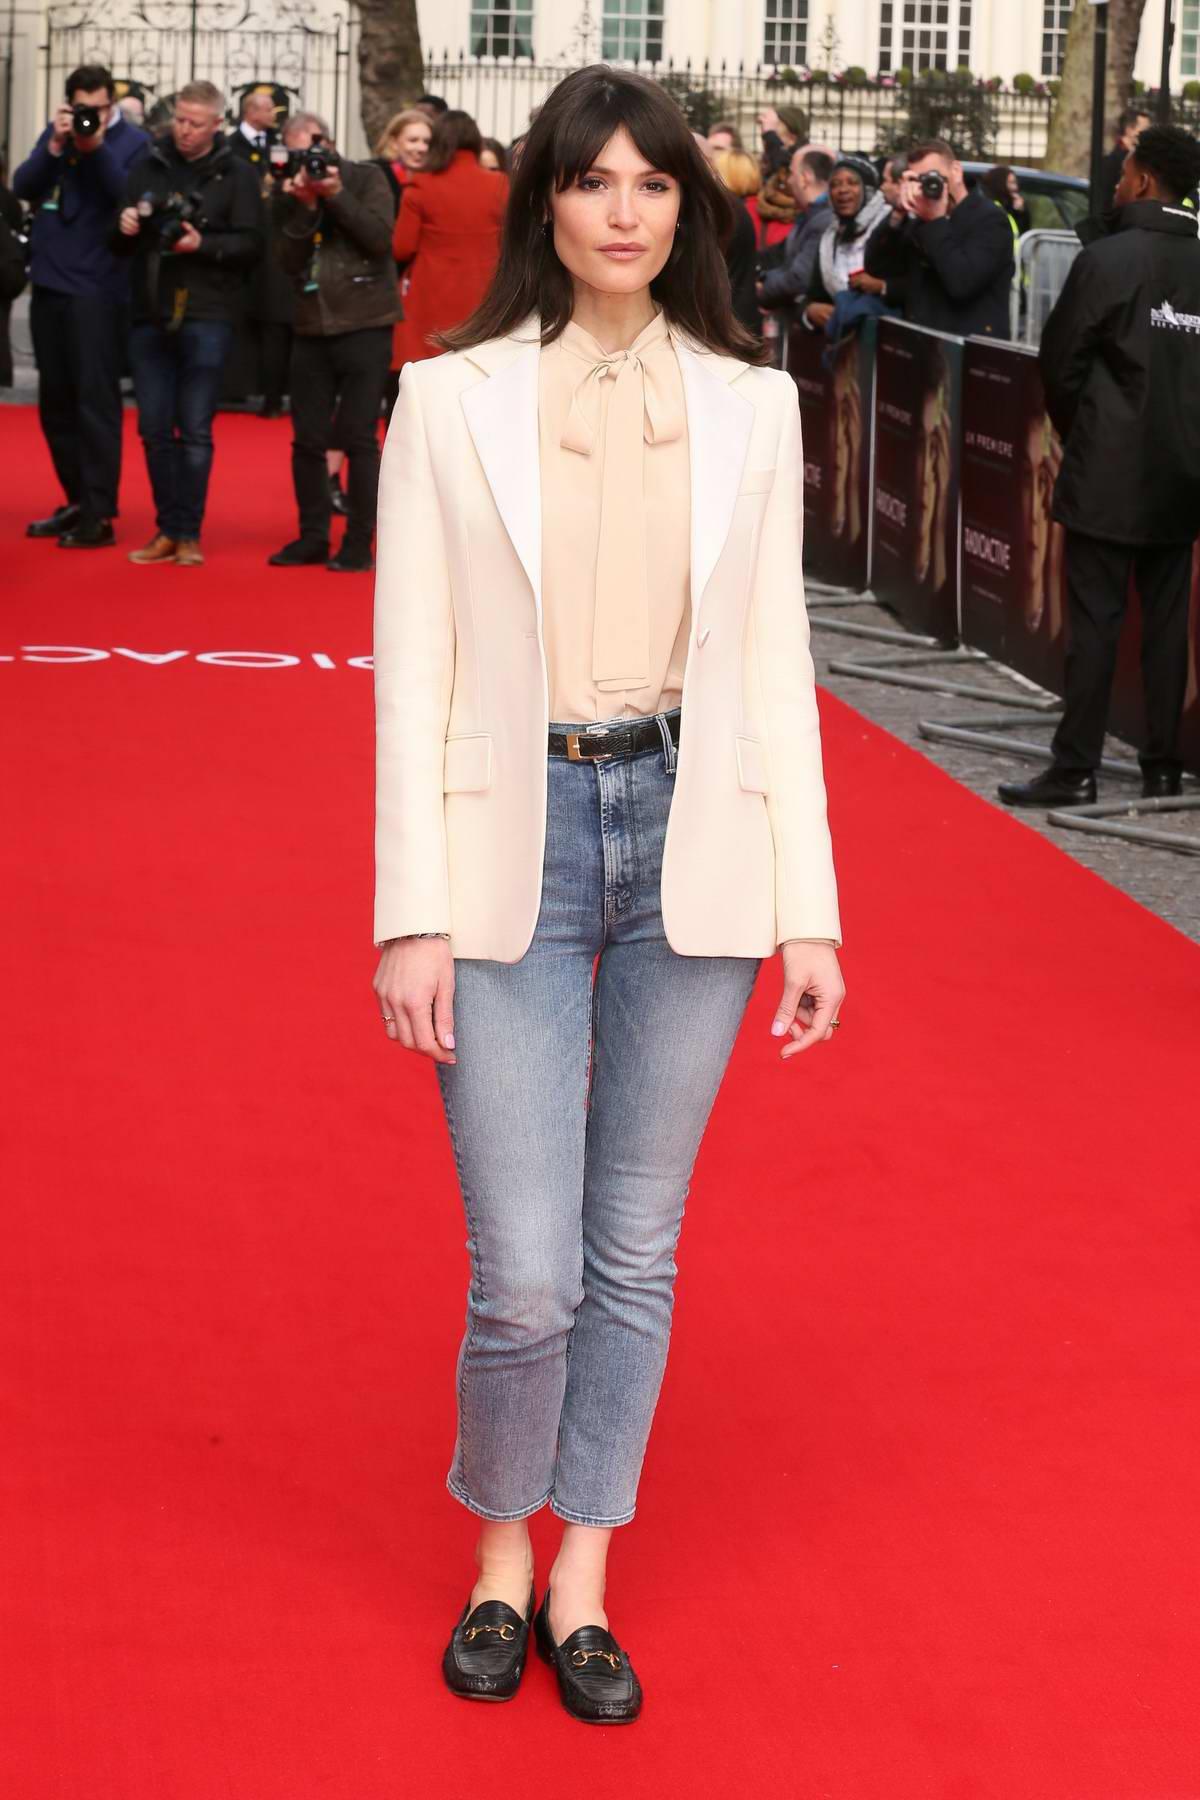 Gemma Arterton attends the Premiere of 'Radioactive' in London, UK